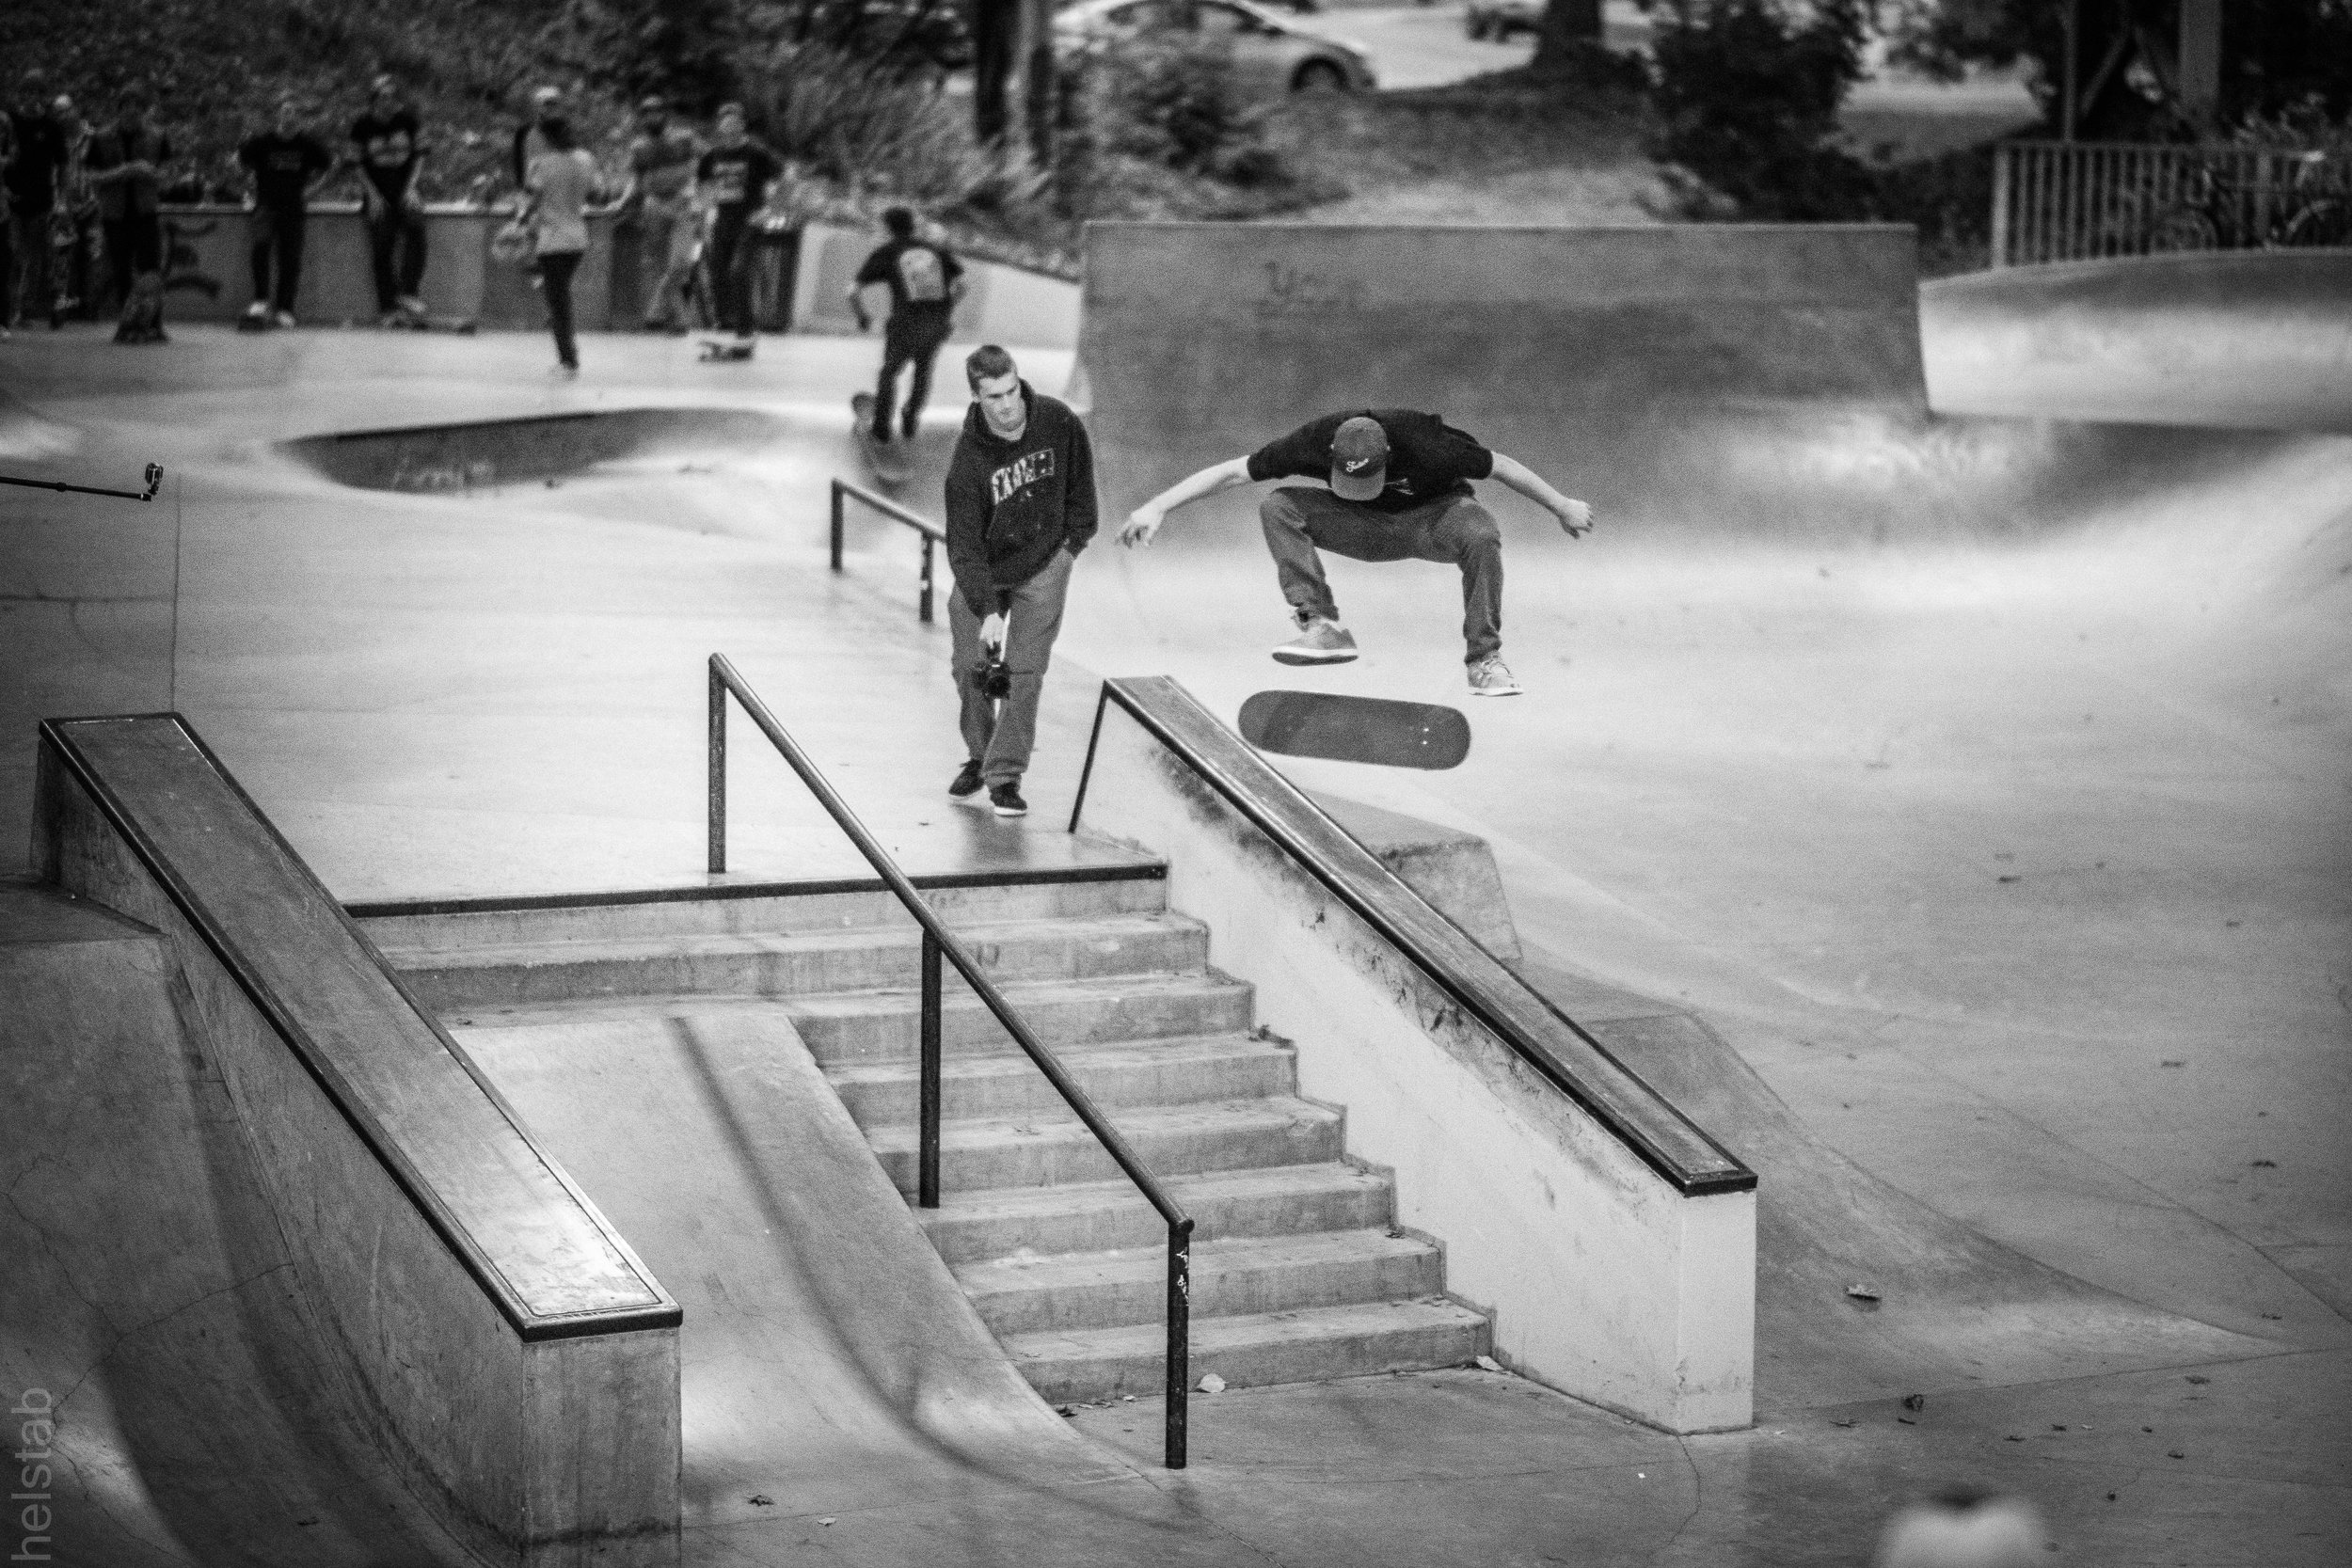 Caleb 'Peep Game' Grant - Kickflip Over Ledge - Photo. Matt Helstab